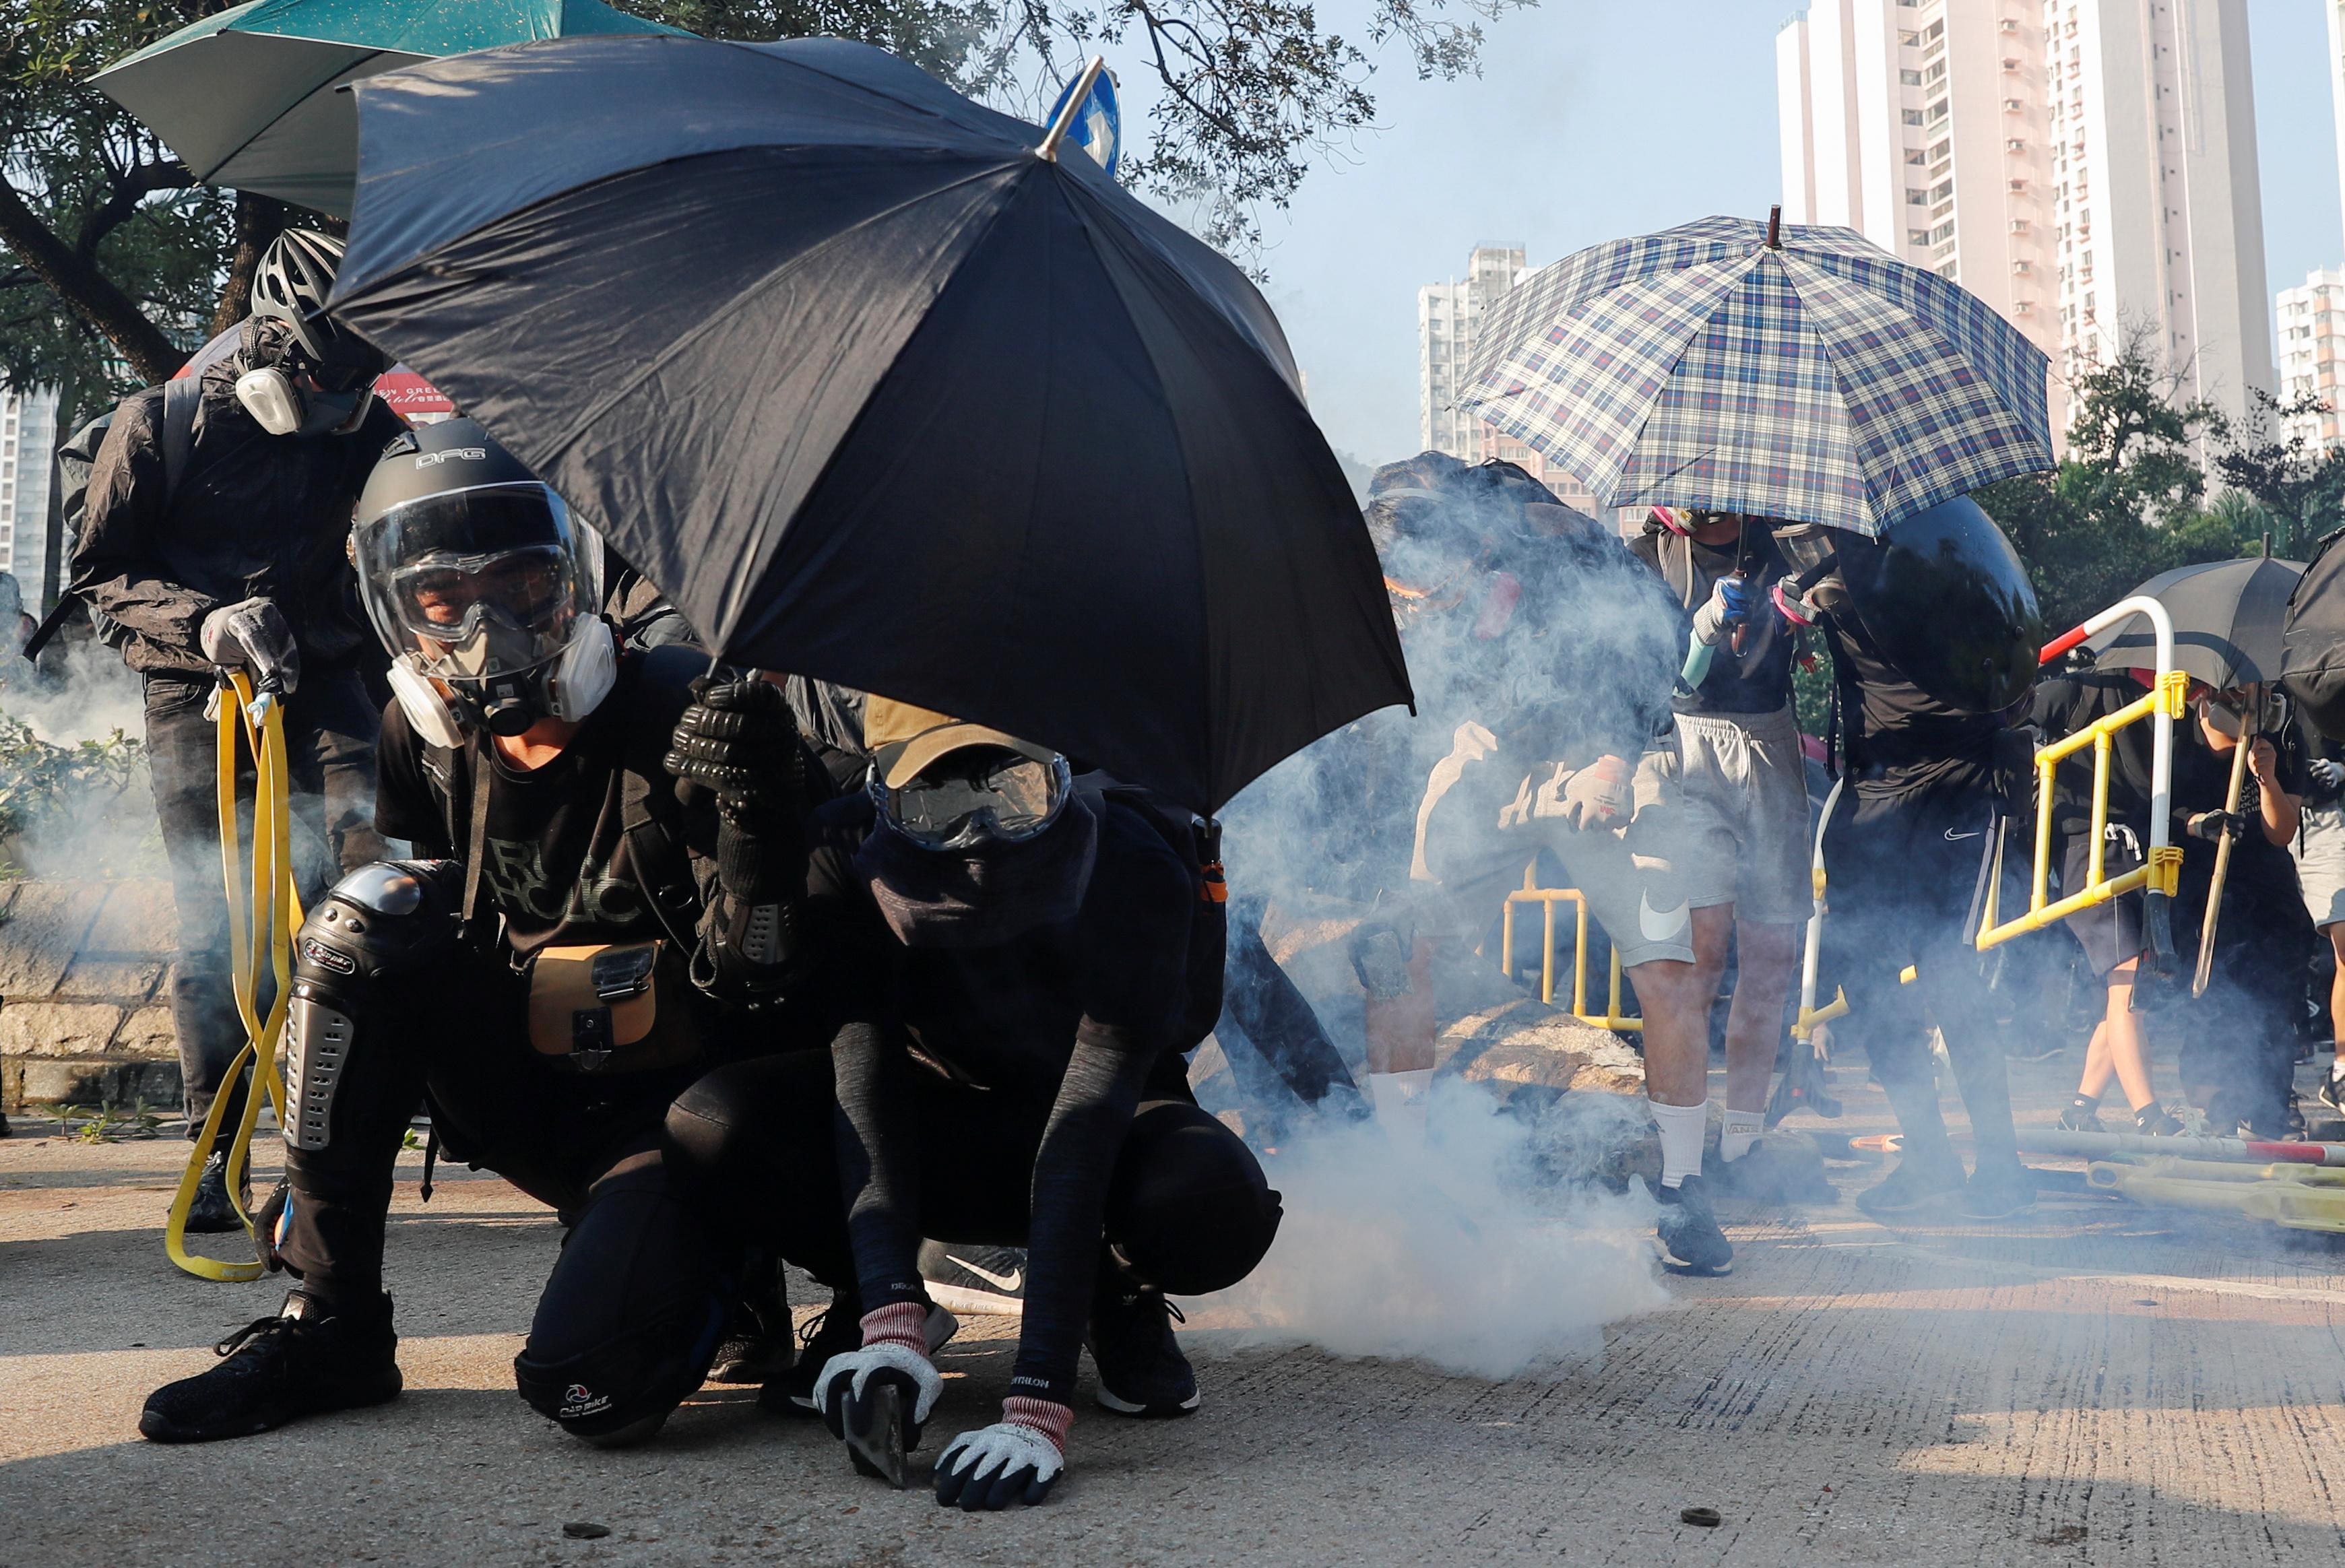 Investors keep their faith in Hong Kong markets despite protests